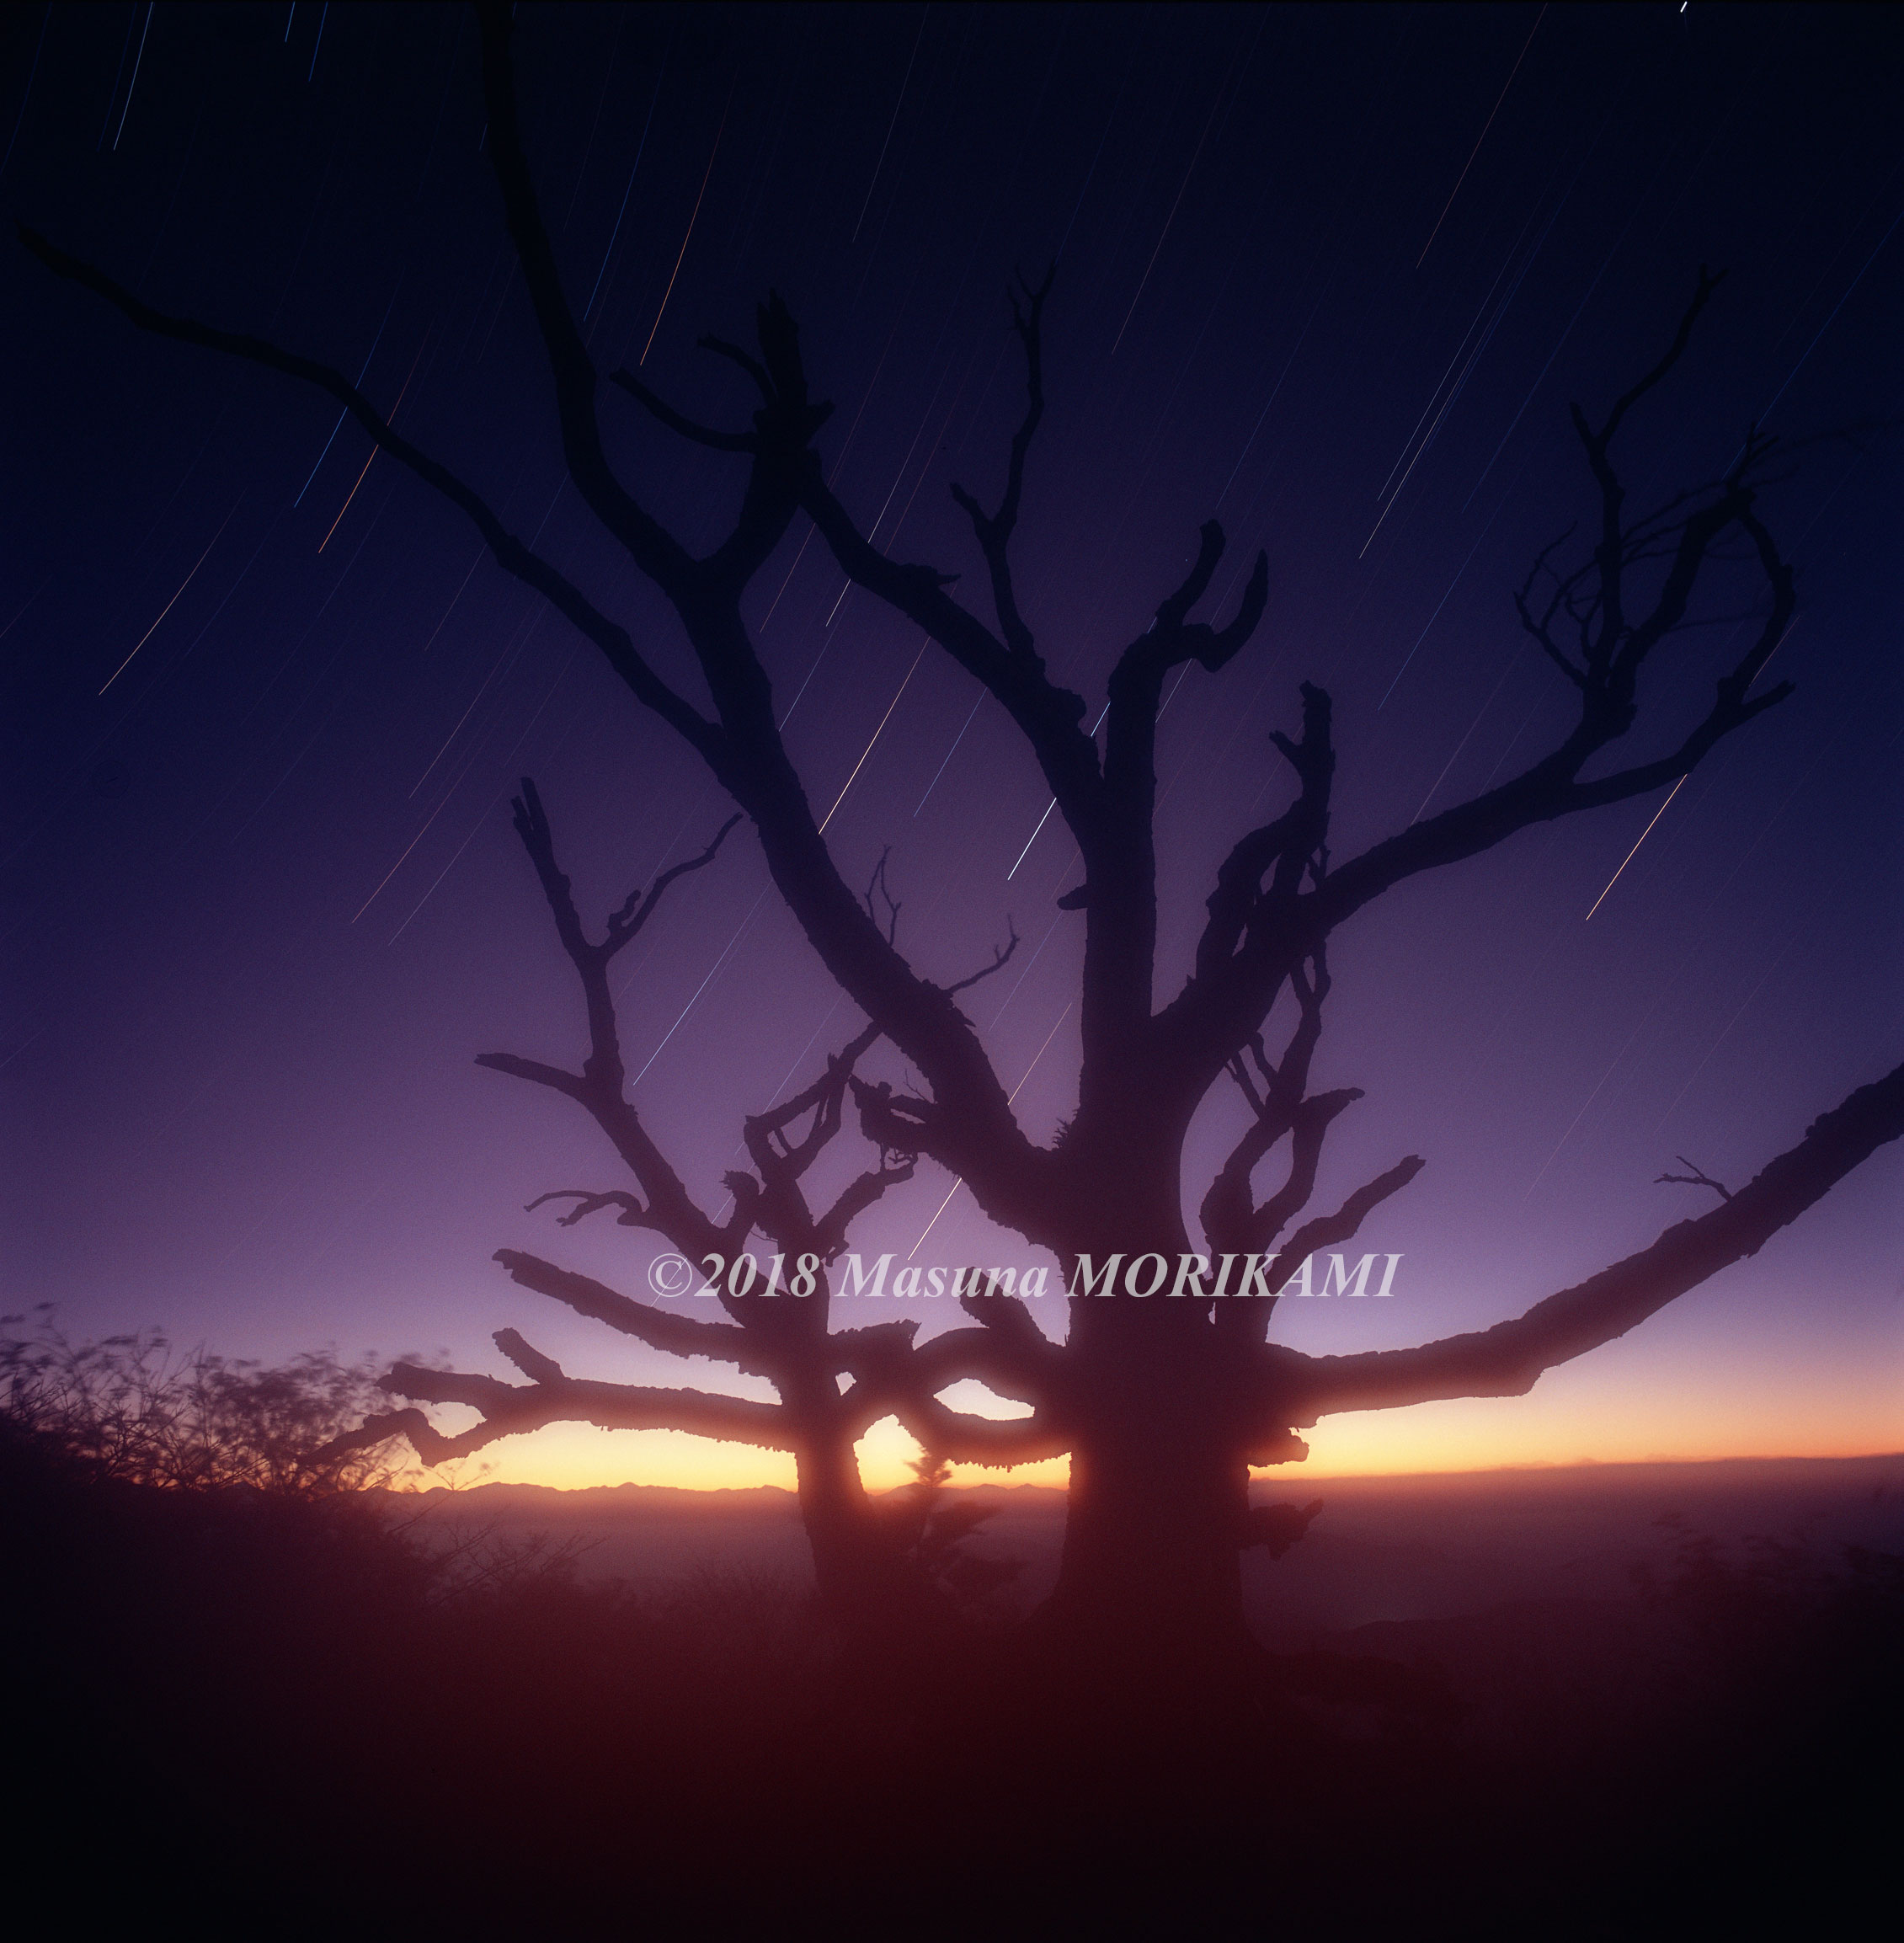 19 夜明け待つ老木/愛知県豊根村/2008.10.12 4:08